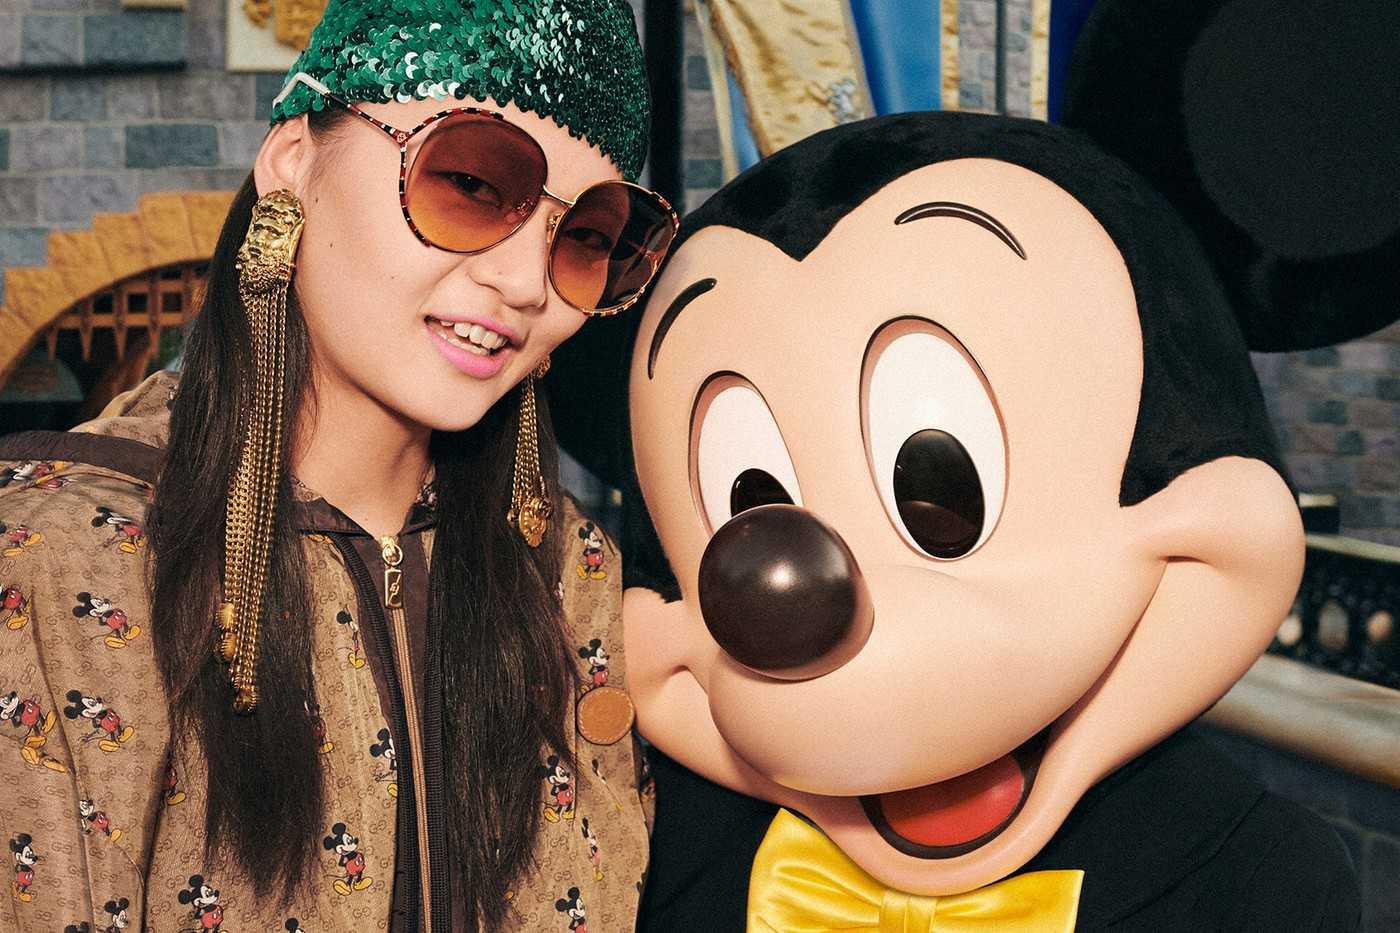 Gucci x Mickye Mouse